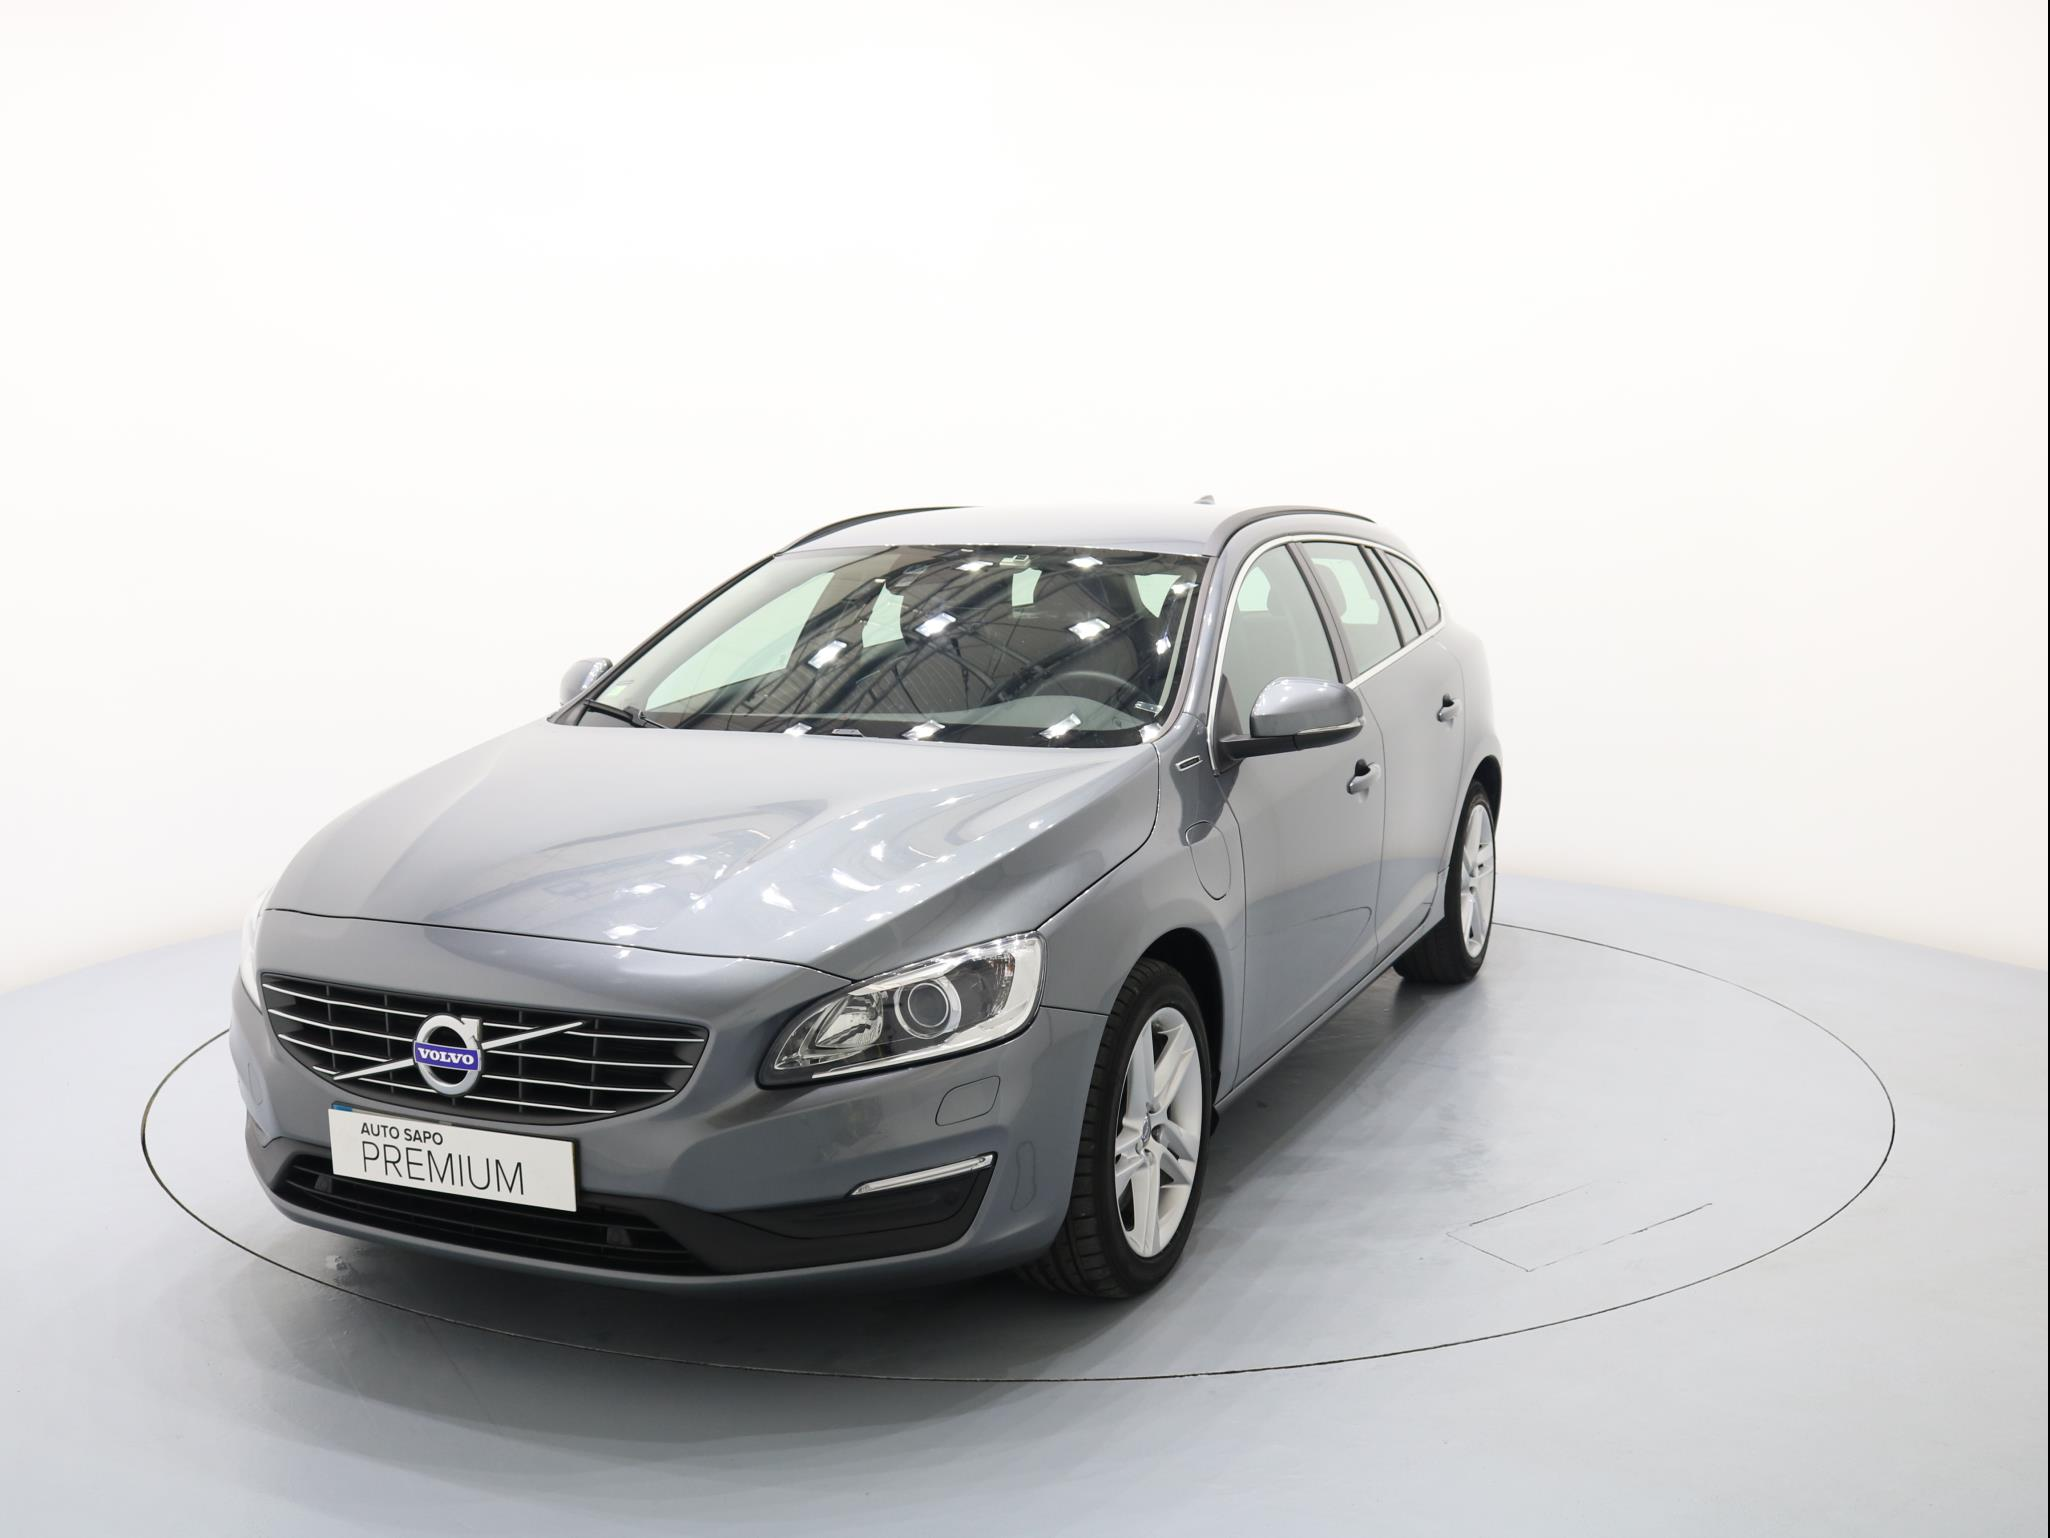 Volvo V60 2.4 D6 Momentum AWD Phev (220cv) (5p) (2013 a presente)